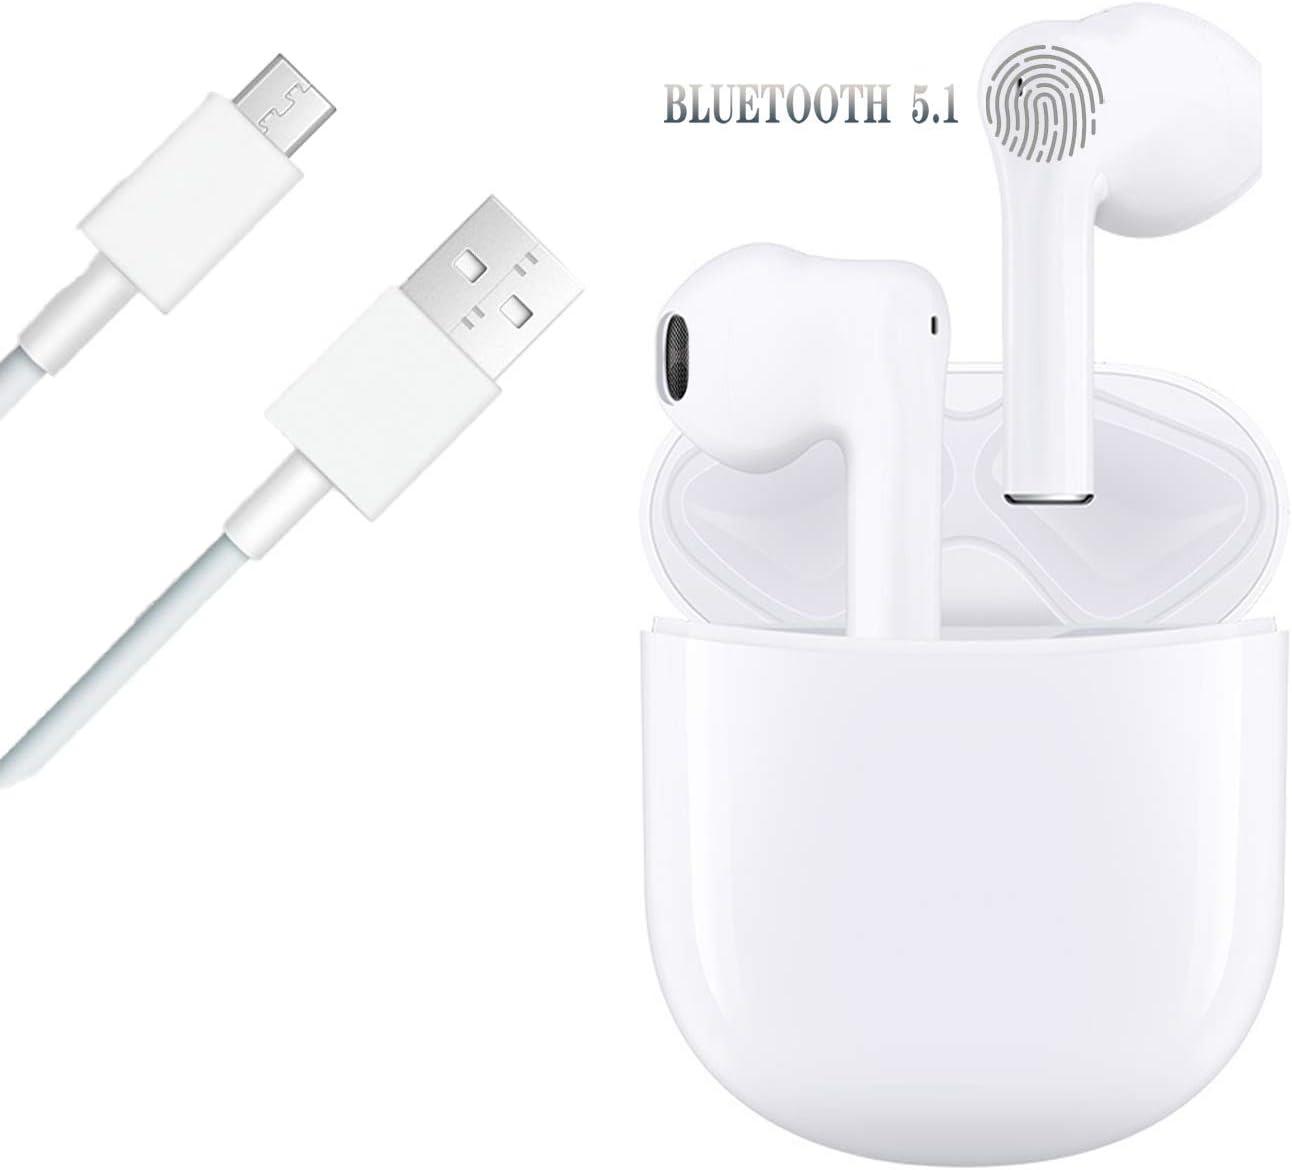 Auriculares Bluetooth Auriculares inalámbricos IPx5 a Prueba de Sudor Auriculares 3D estéreo a Prueba de Agua Toque Auriculares Deportivos Funciona Compatible con Apple/Airpods/iPhone/Android/Samsung